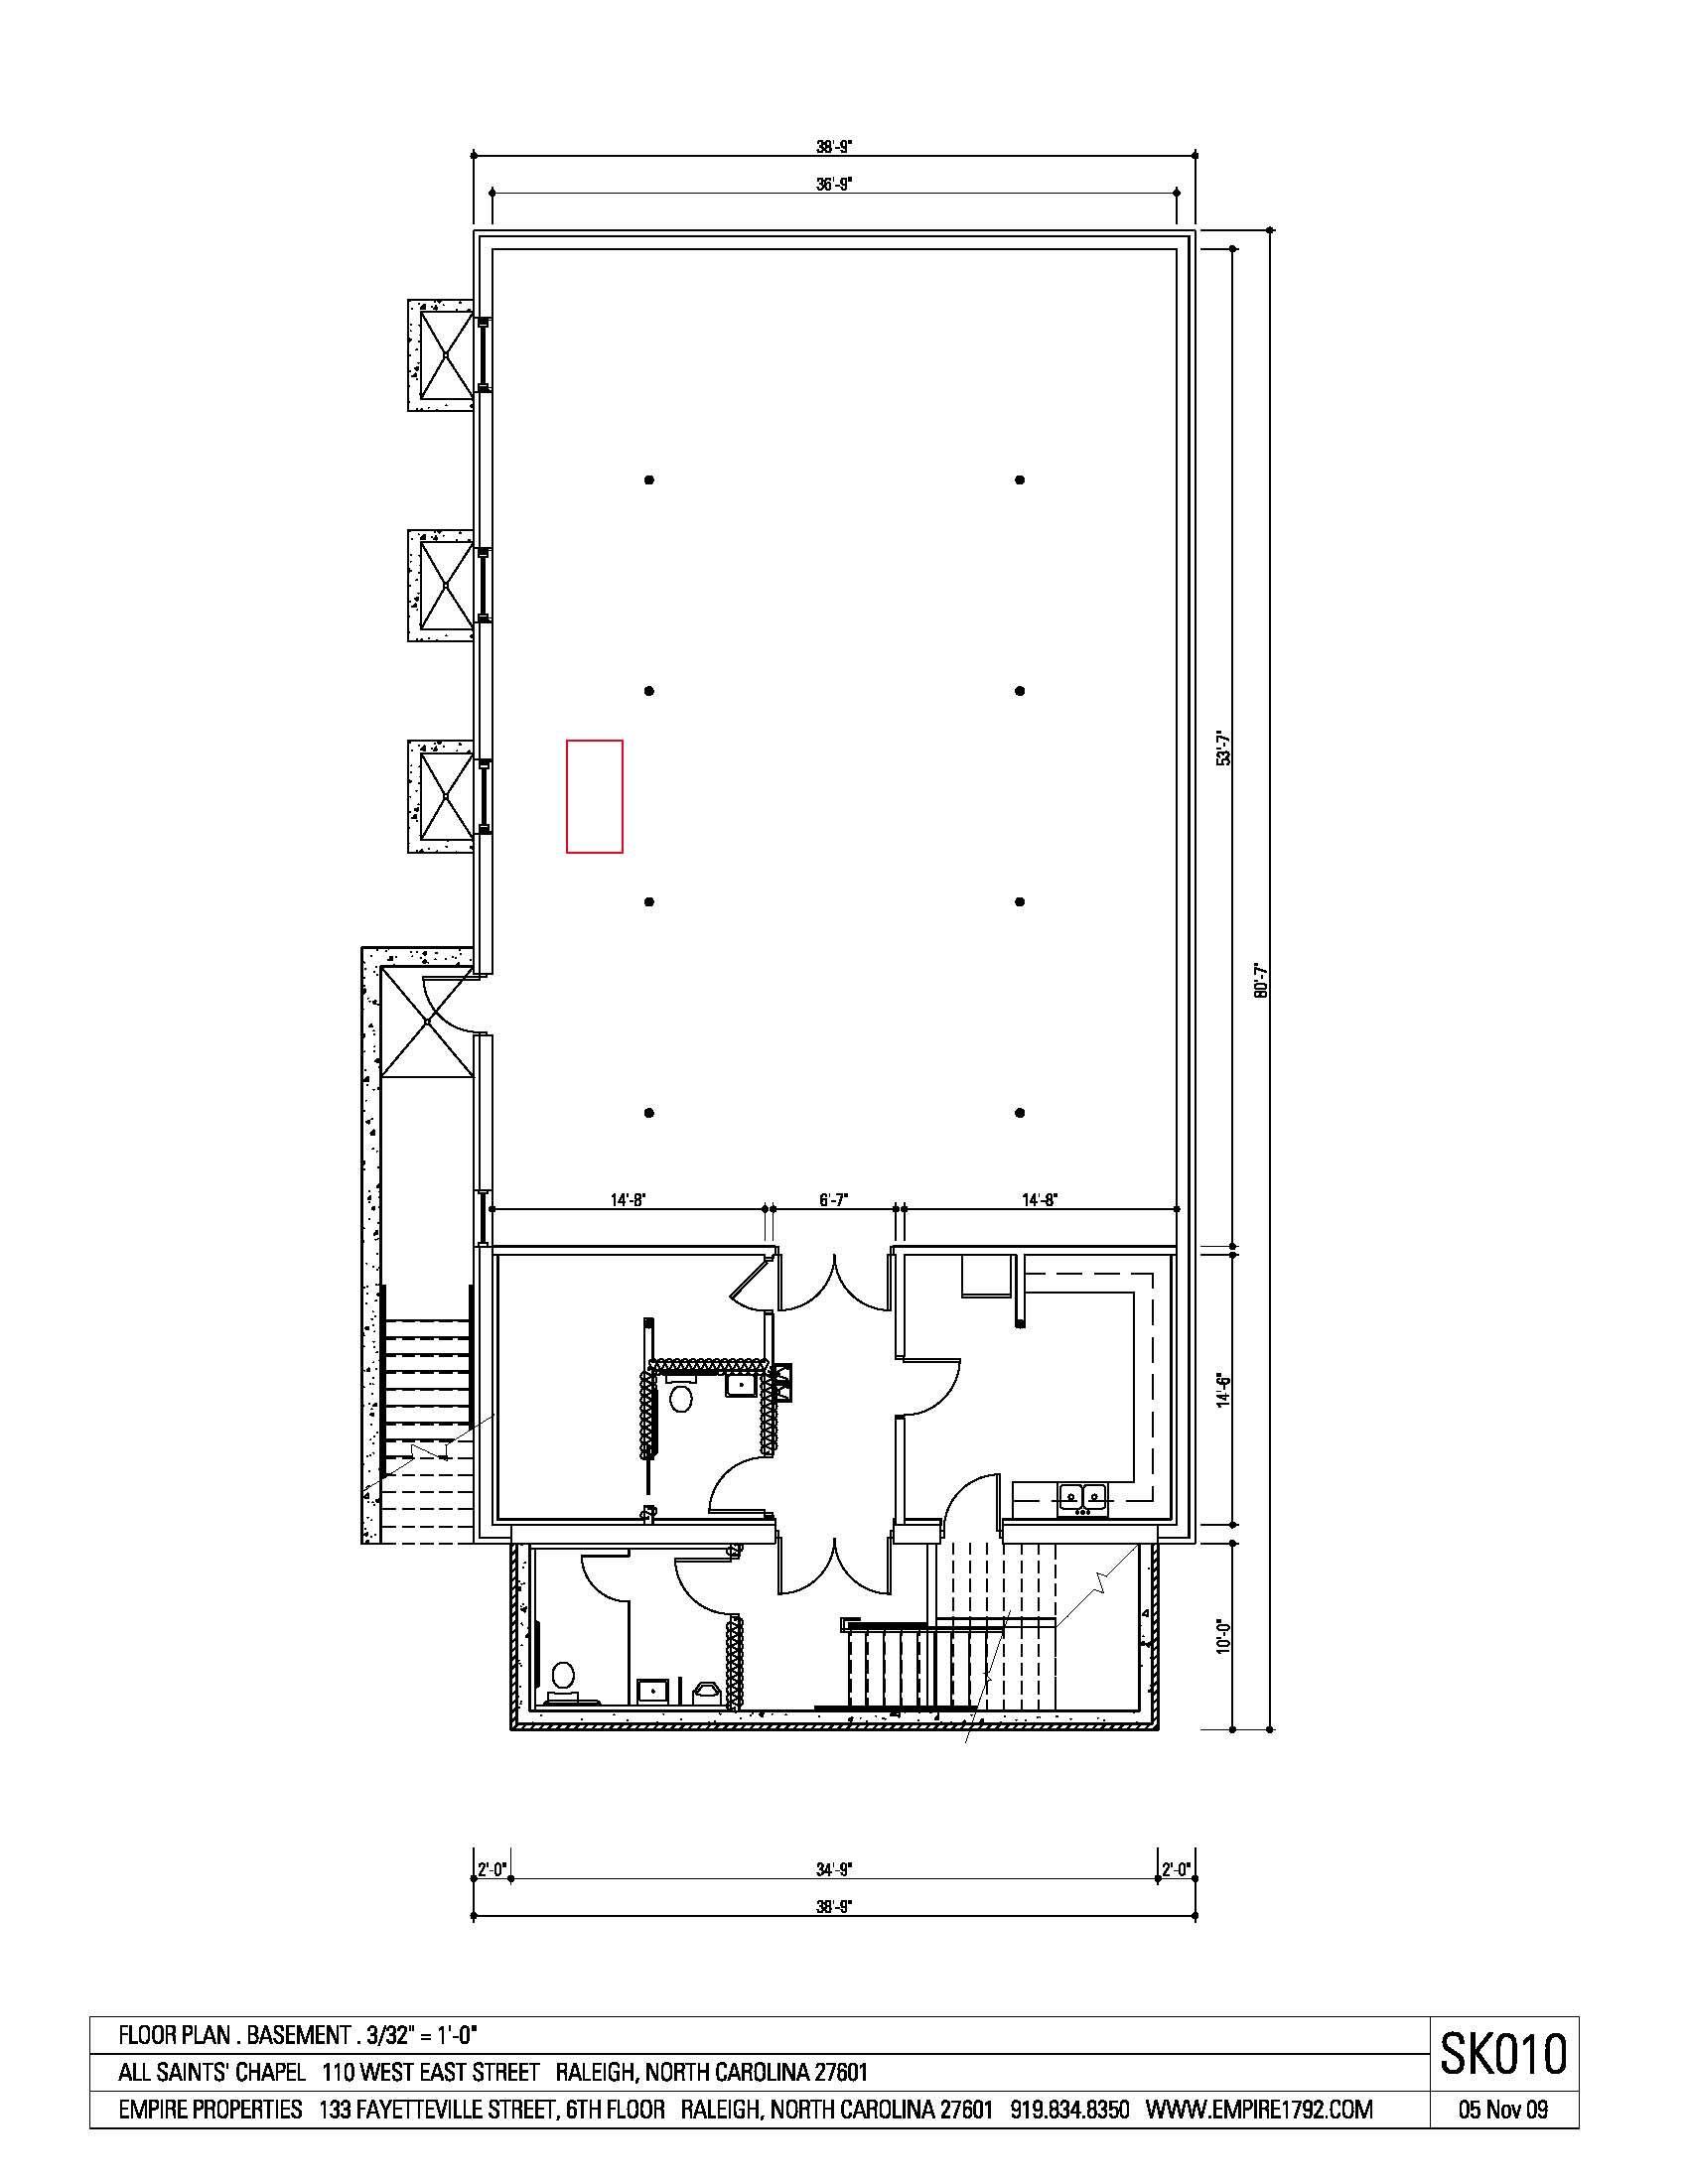 All Saints Chapel downstairs floor plan | Alison's Wedding | Pinterest